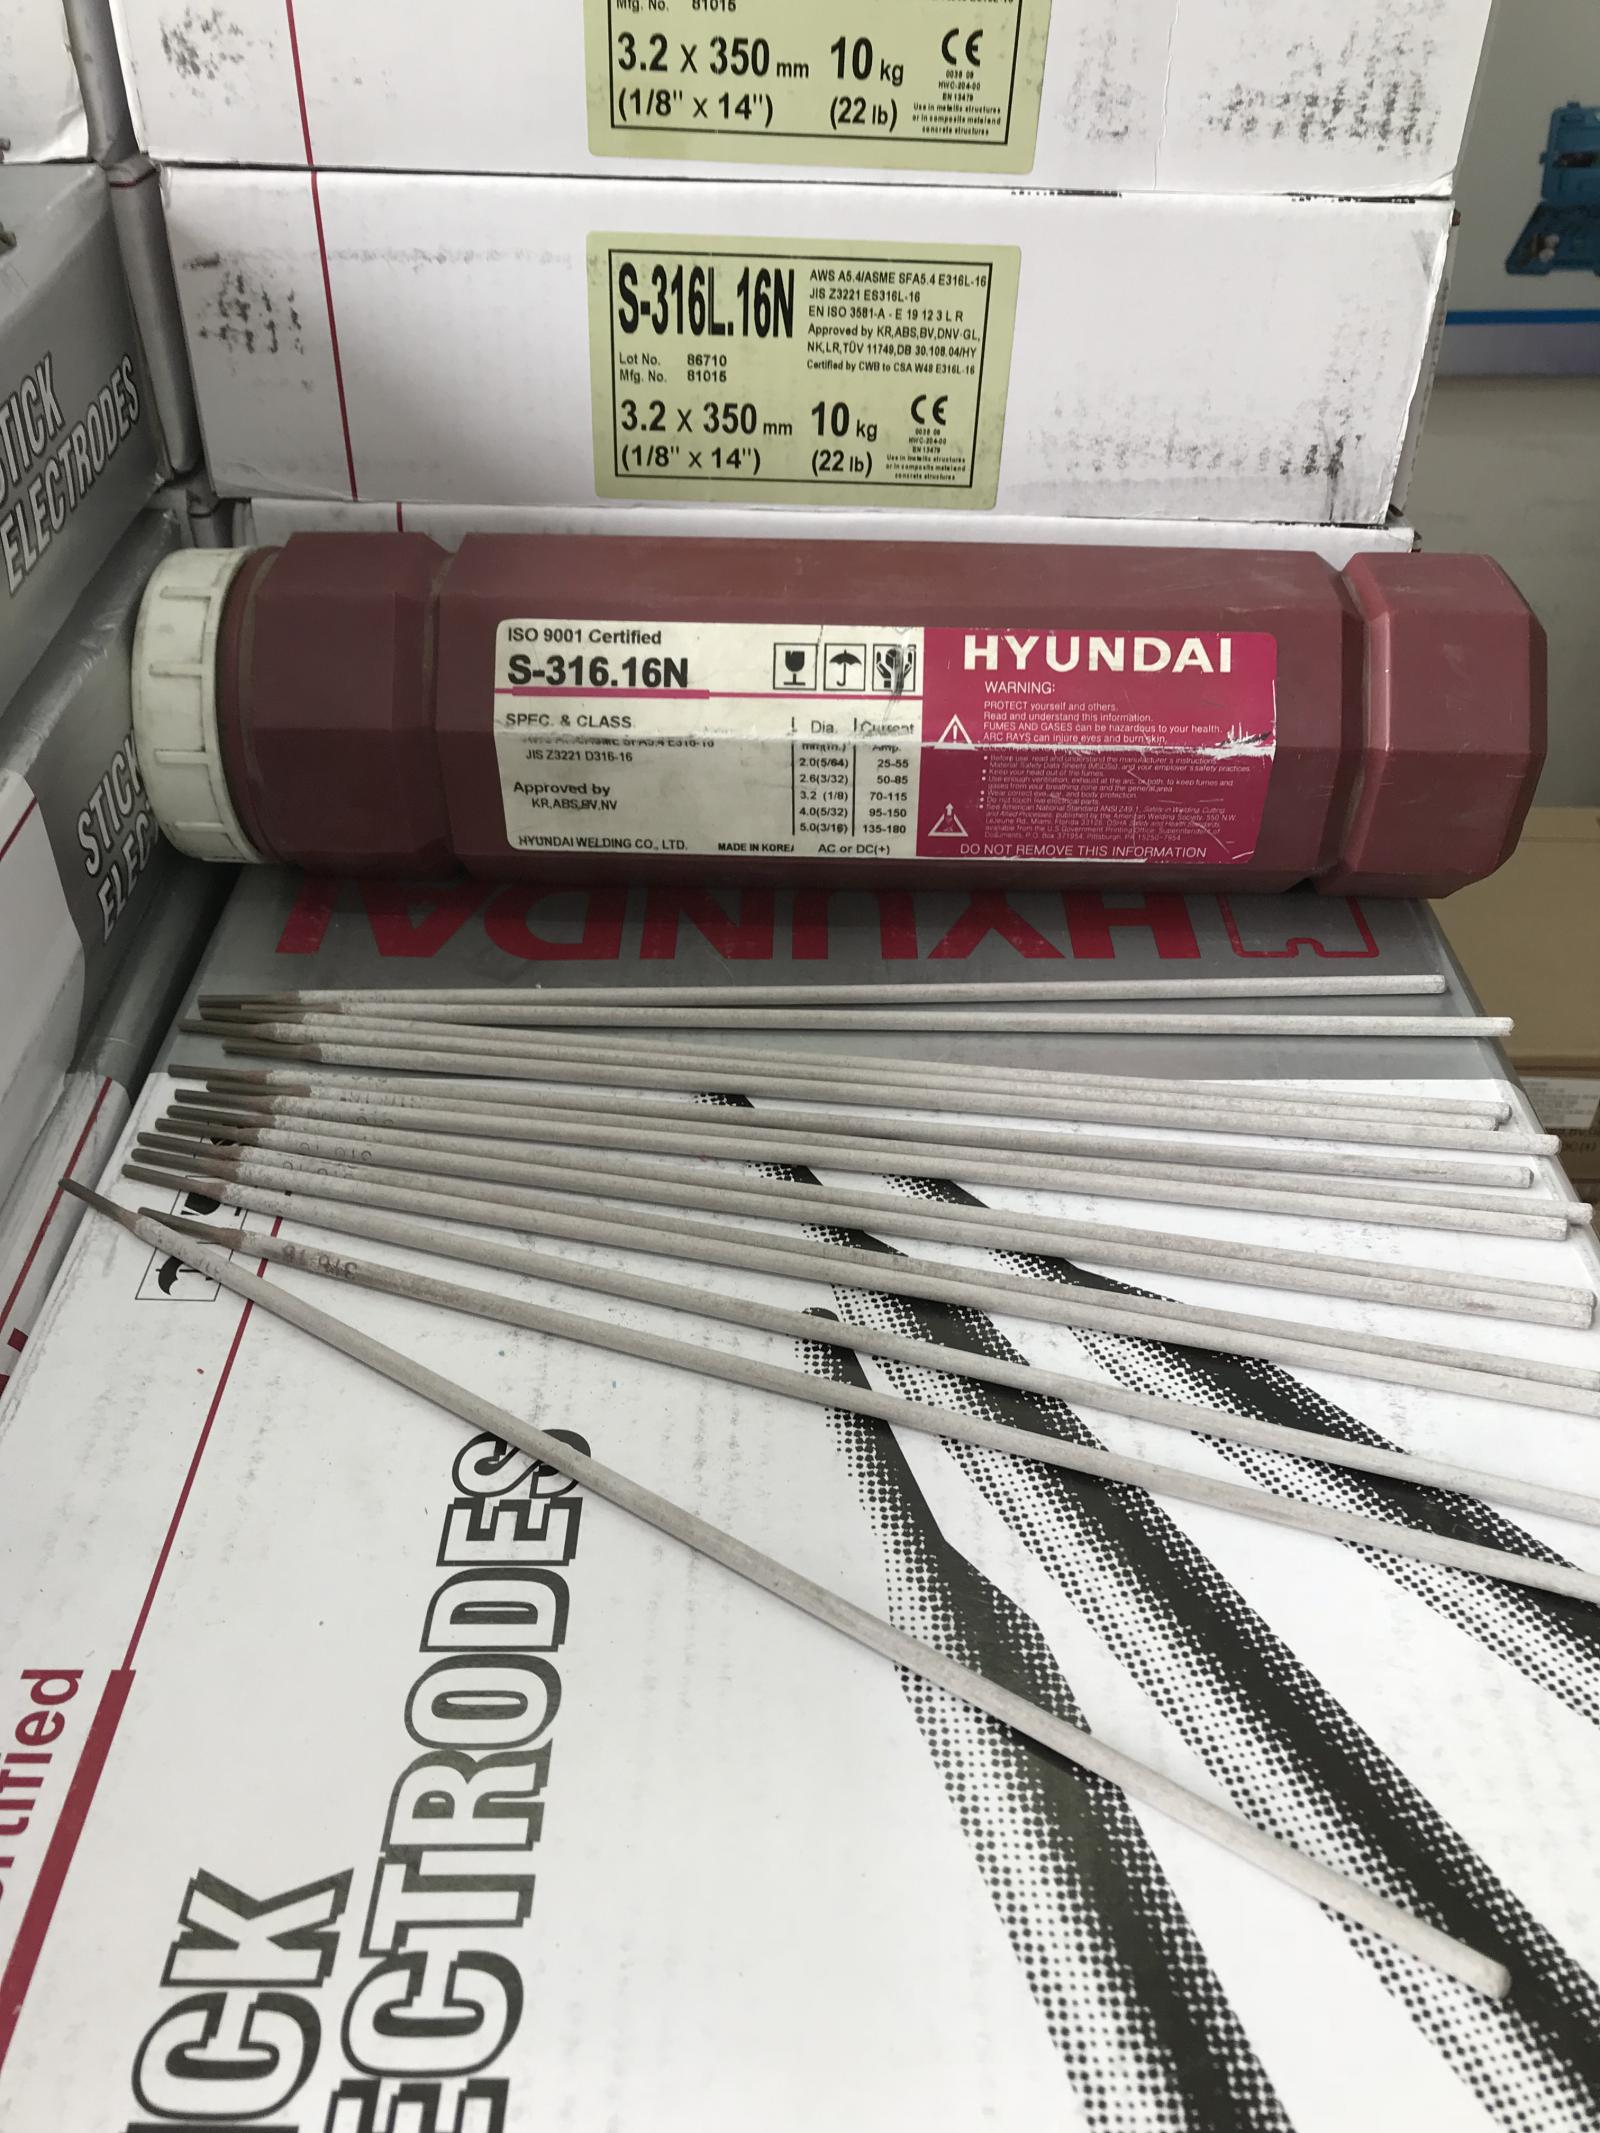 Image result for Hyundai S-316.16N